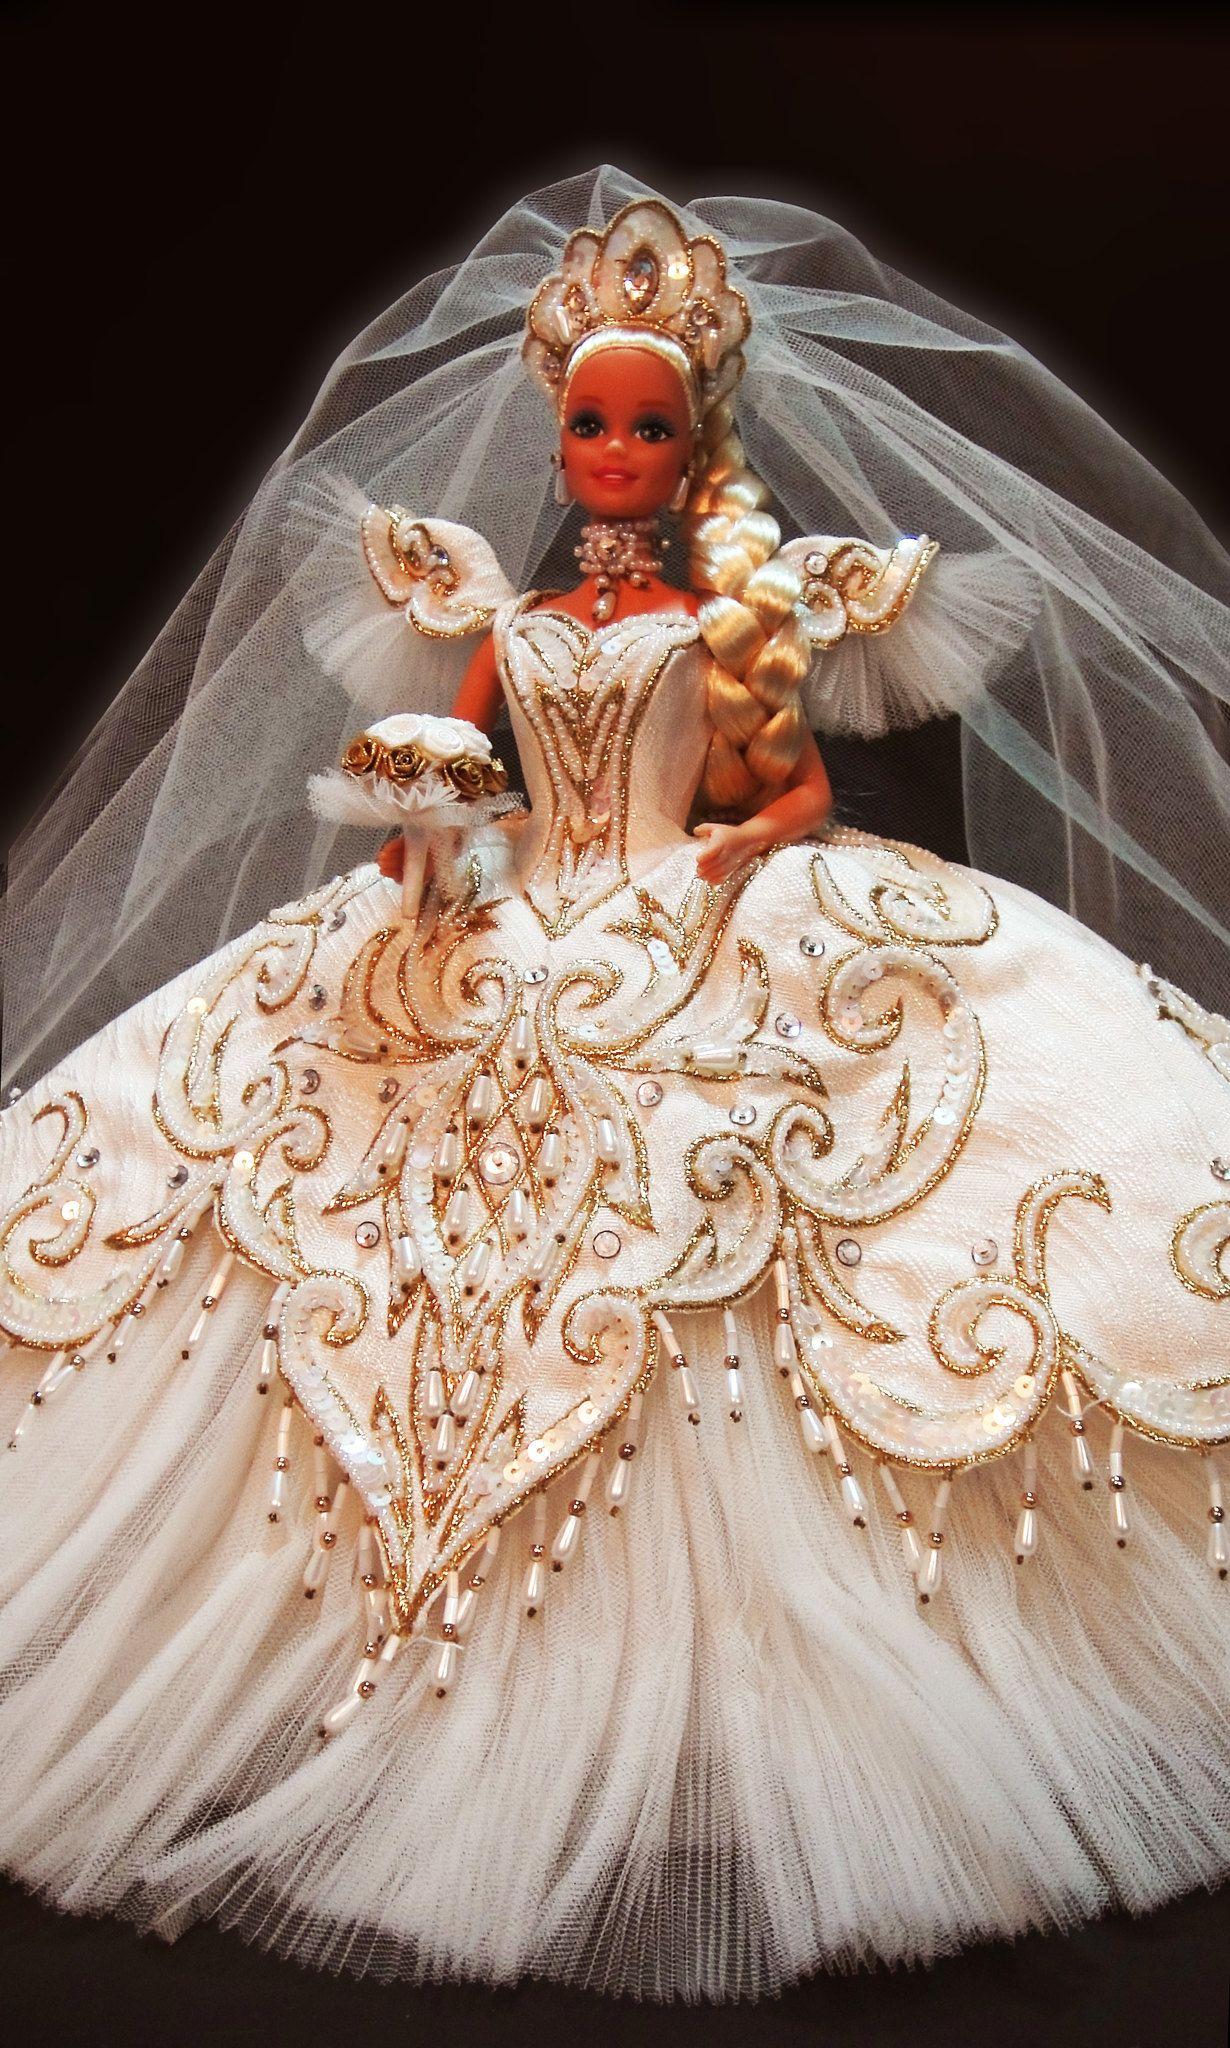 Empress Bride Barbie by Bob Mackie